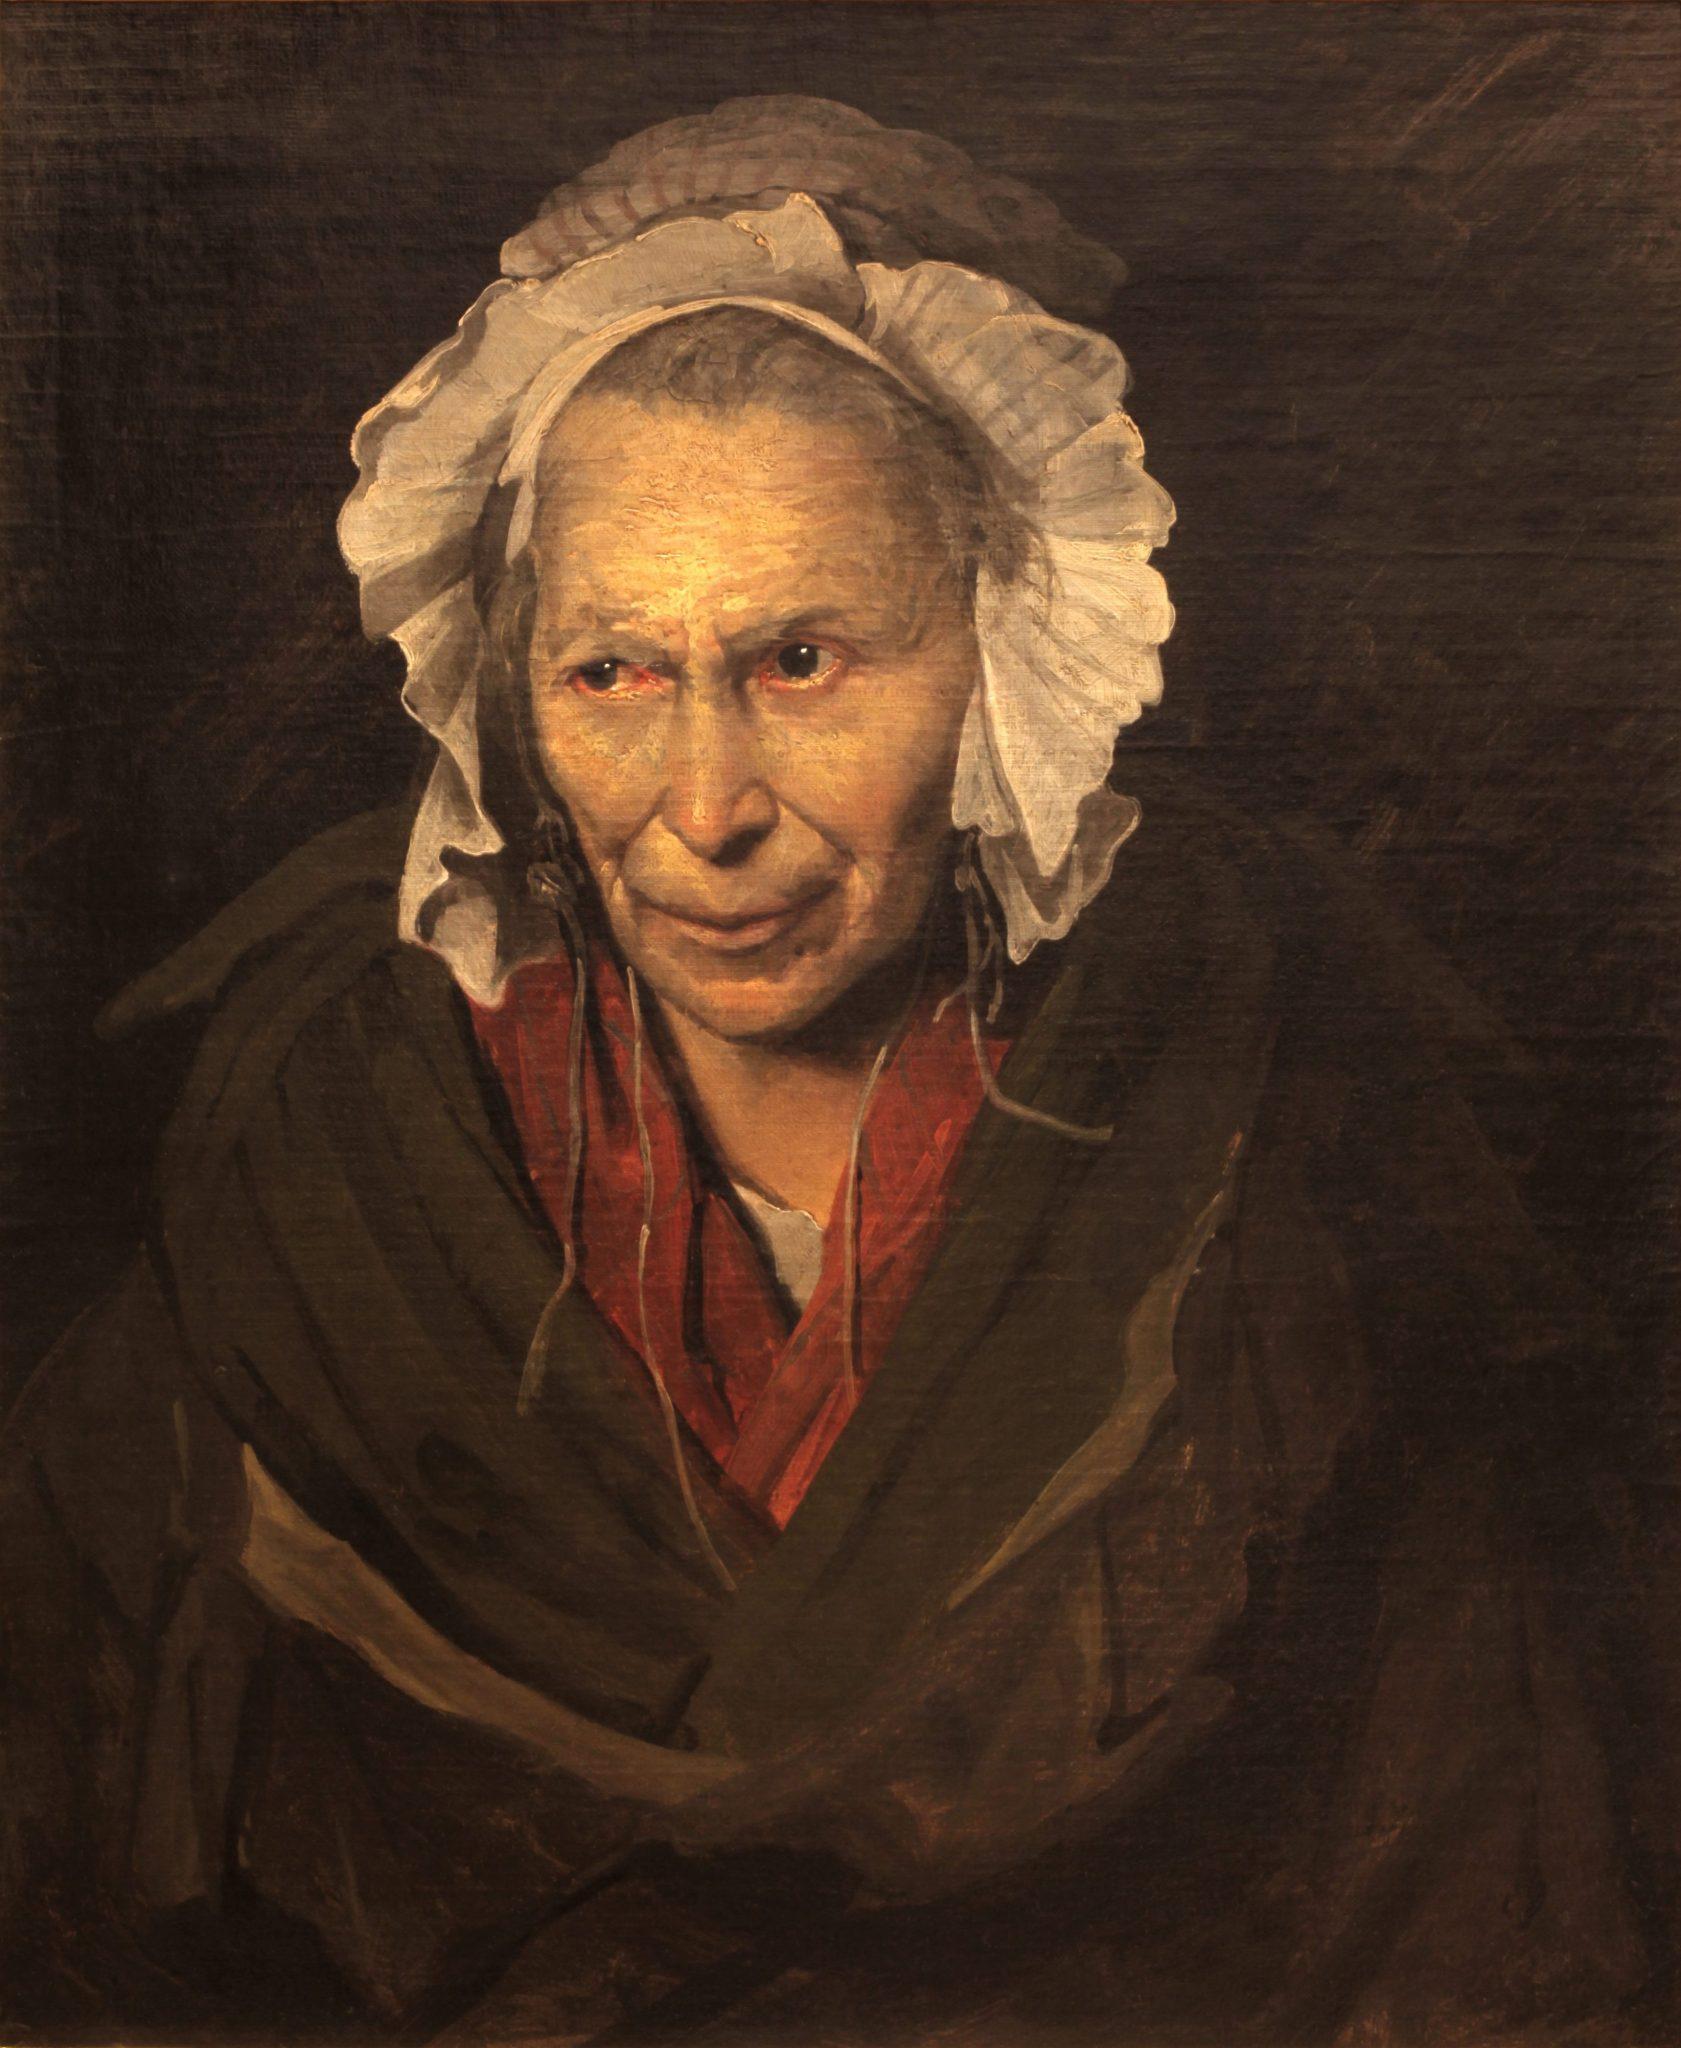 زن دیوانه اثر تئودور ژریکو